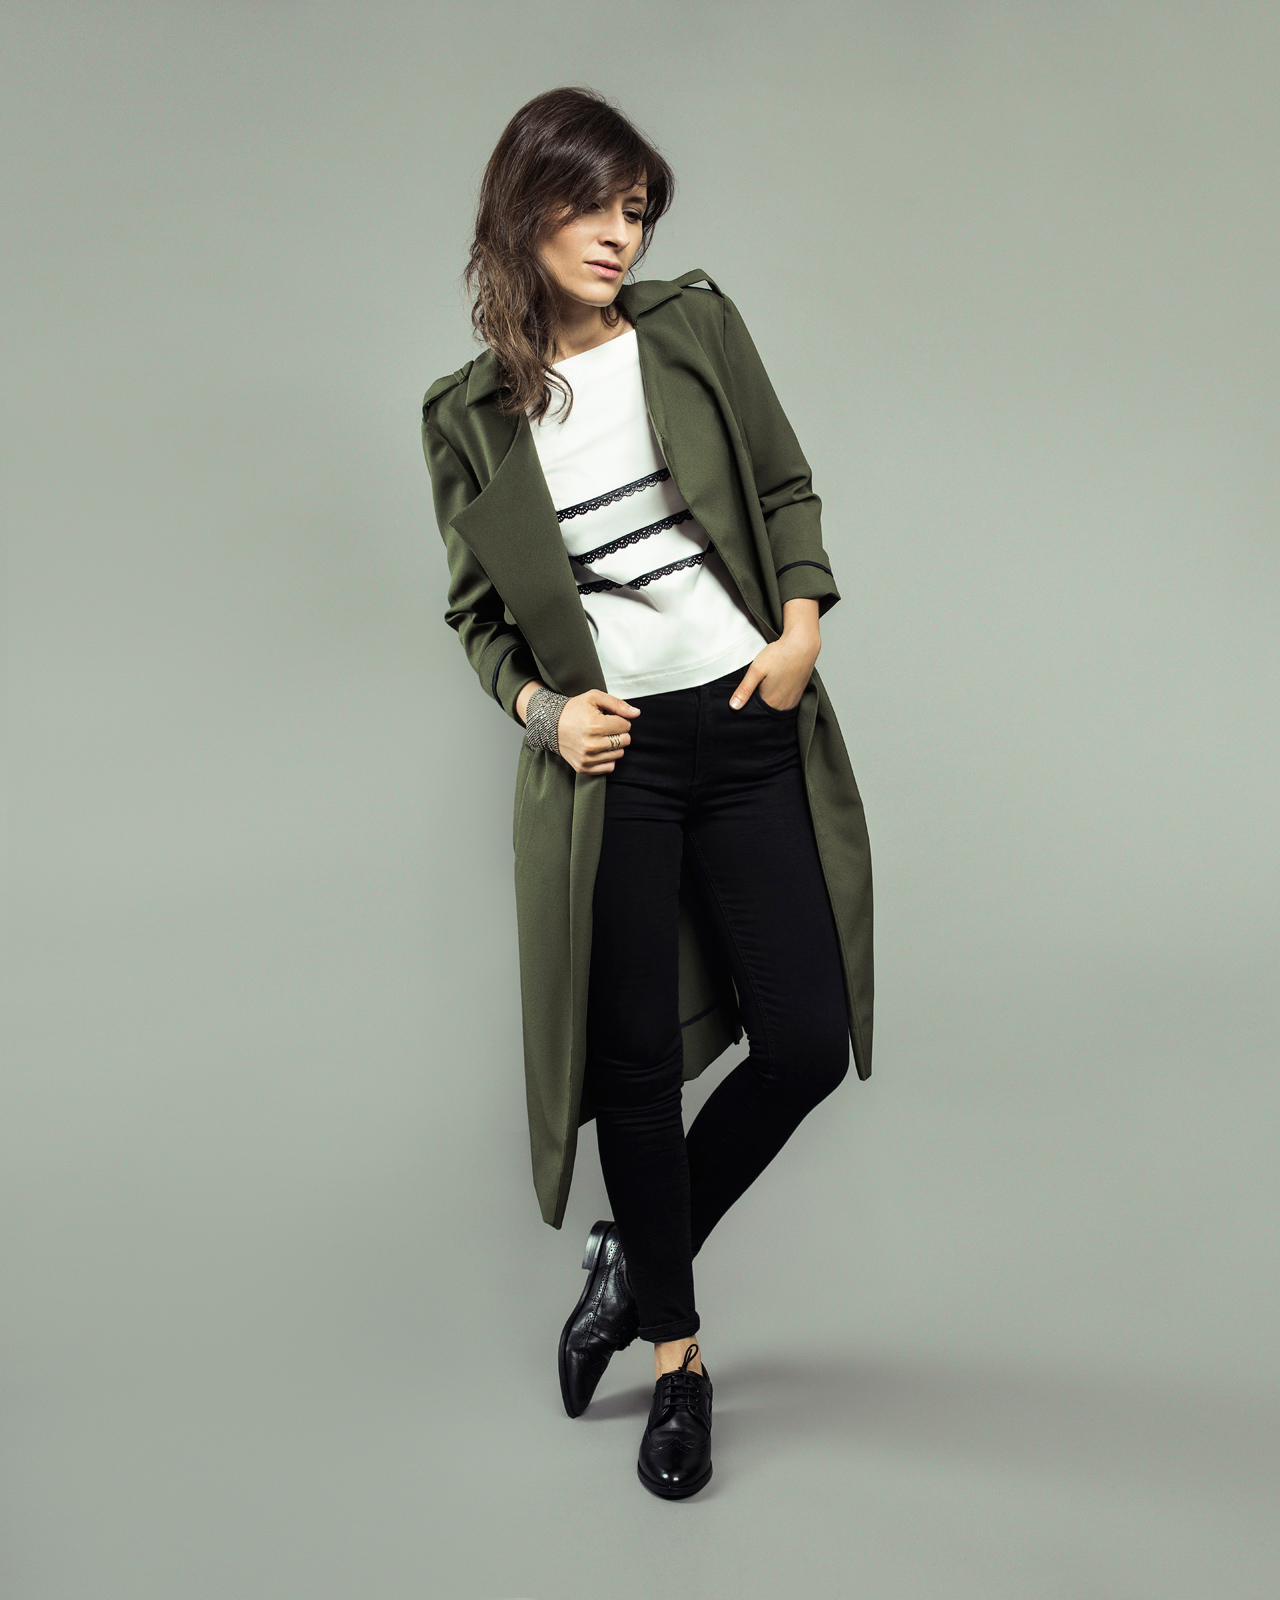 ORAGEUSE - Patrons de couture contemporains pour femme / contemporary sewing patterns for women - Trench Londres